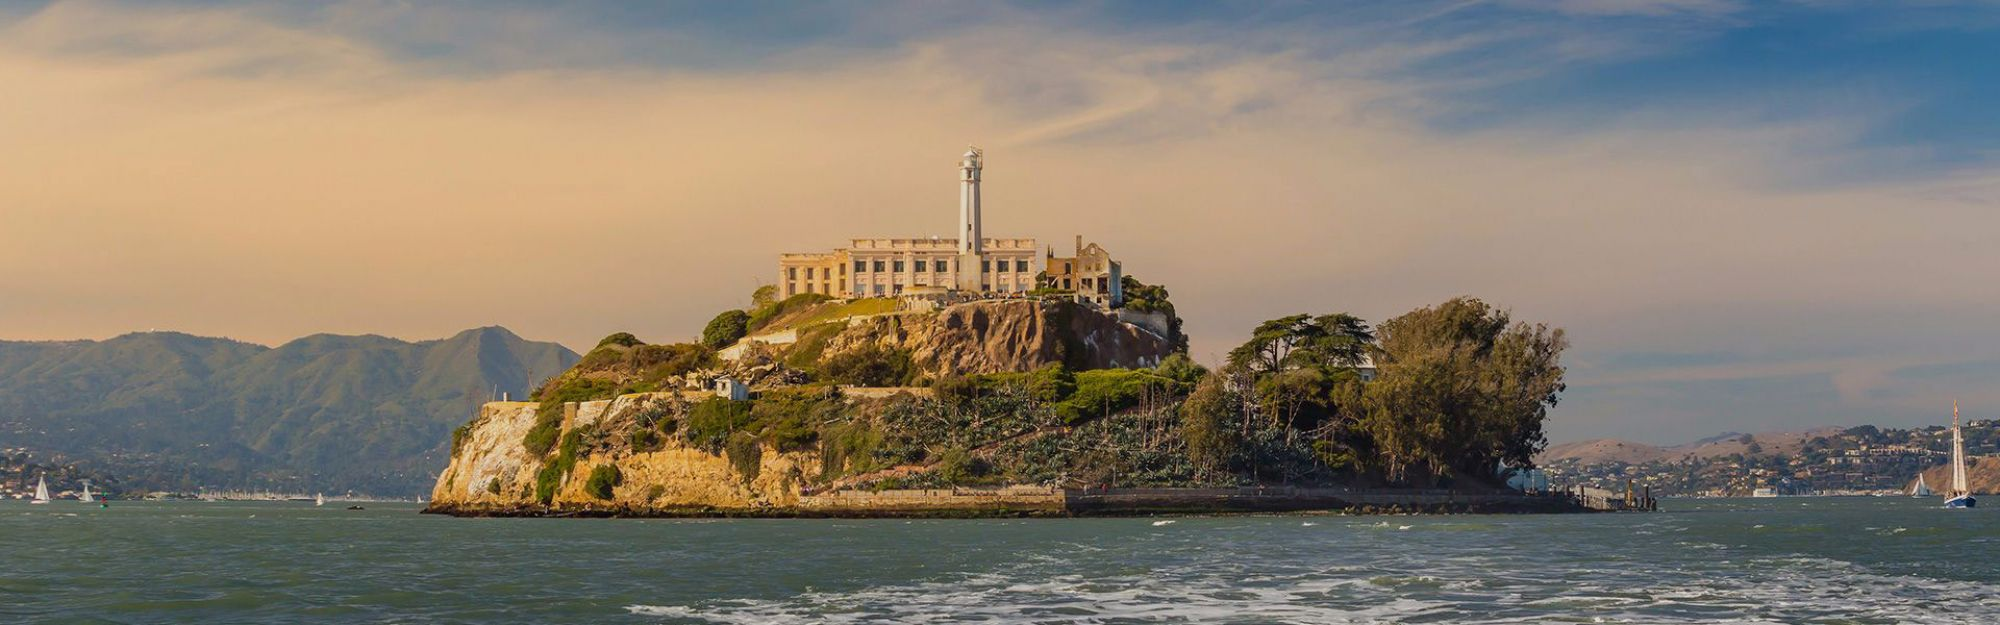 San Francisco Premium Ticket + Alcatraz (Off-Peak)